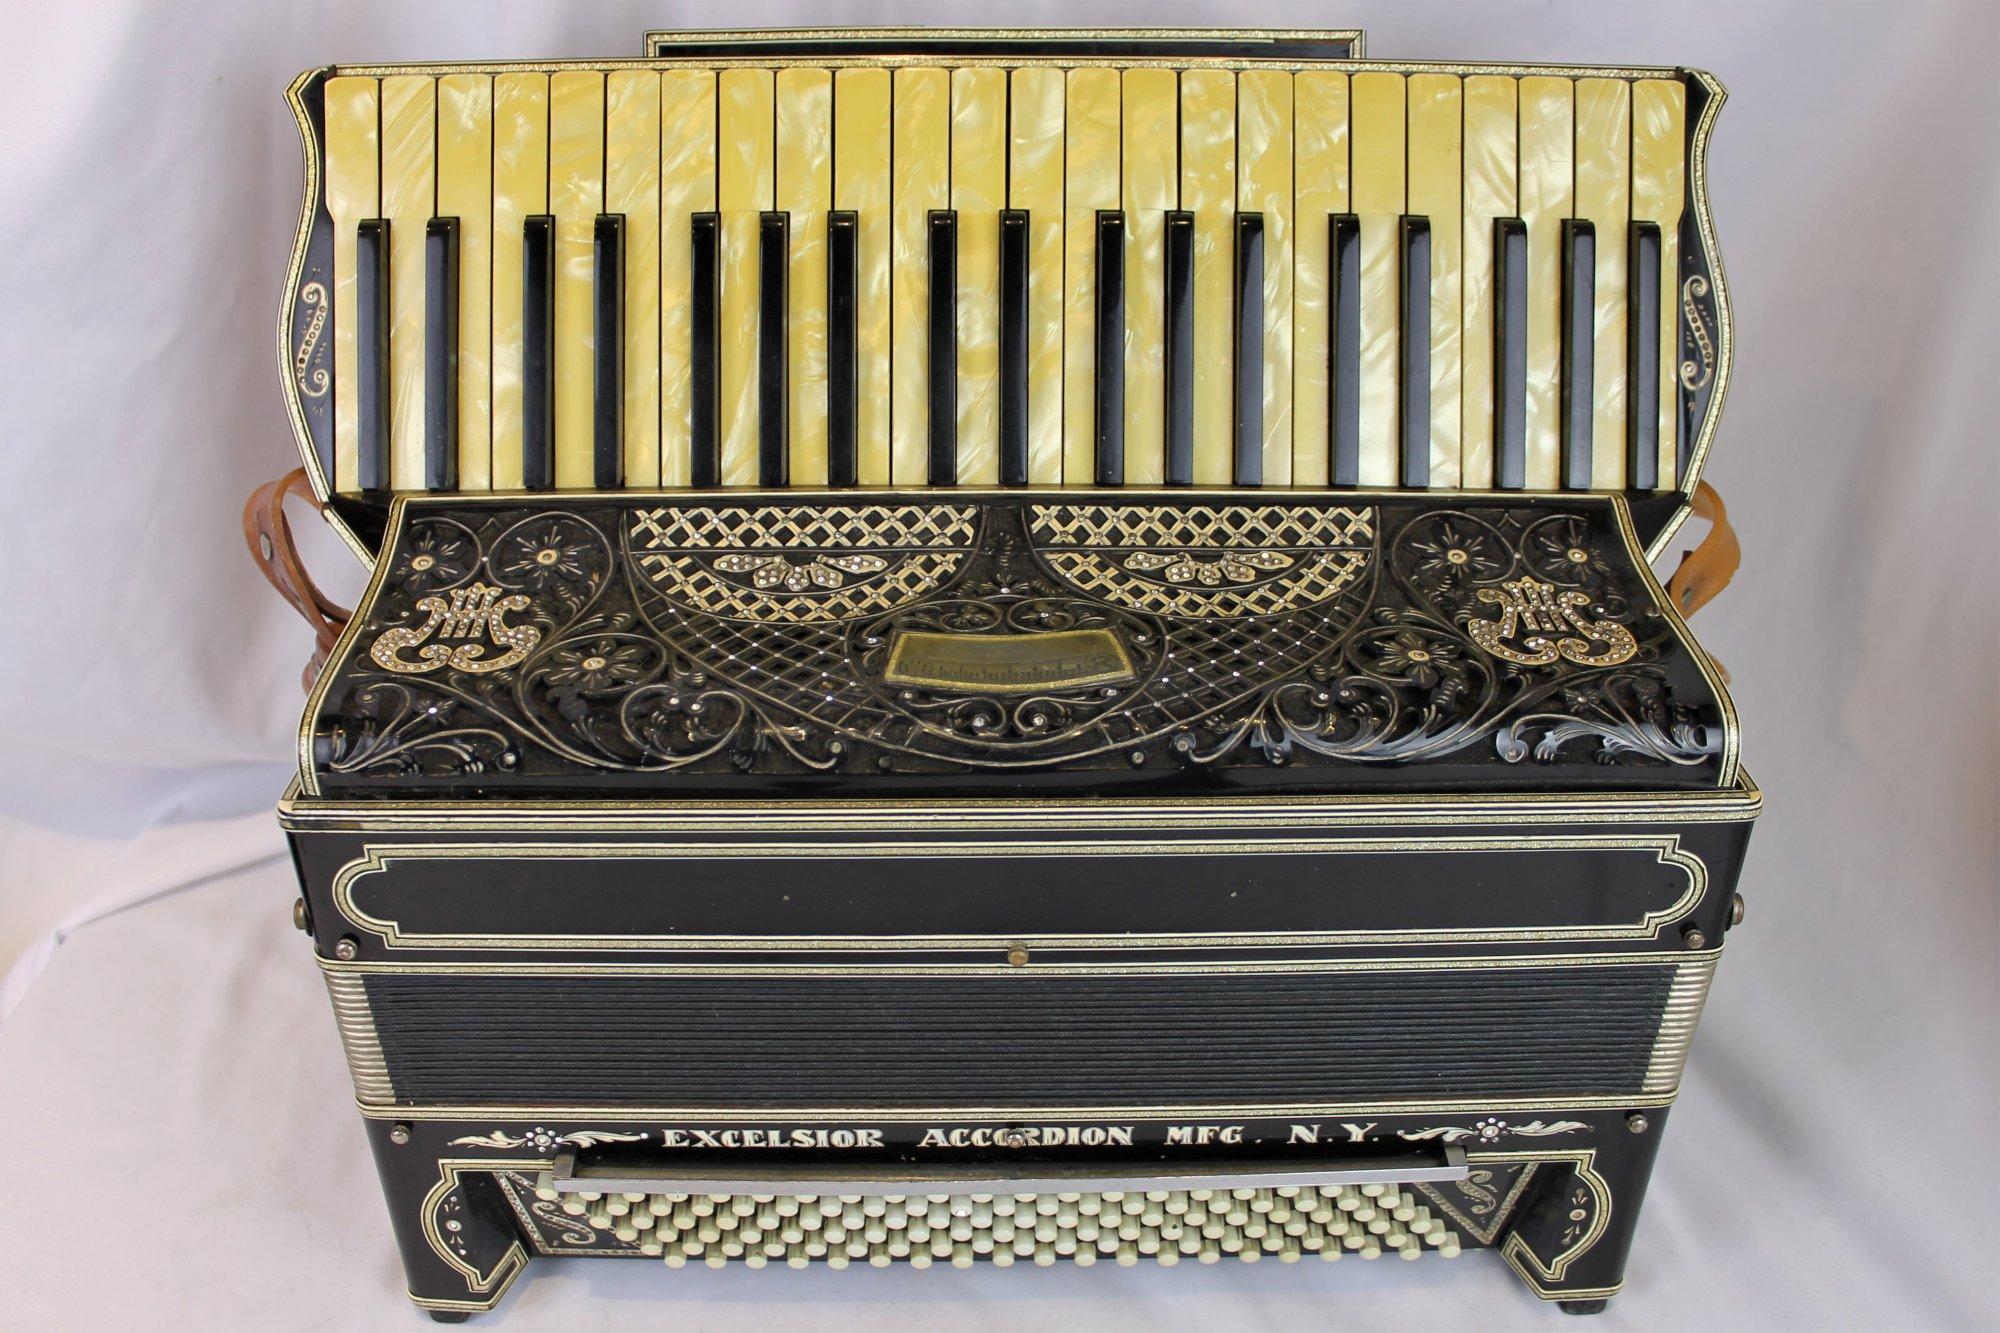 4636 - Black Antique Excelsior Piano Accordion LMM 41 120 - For Parts or Repair